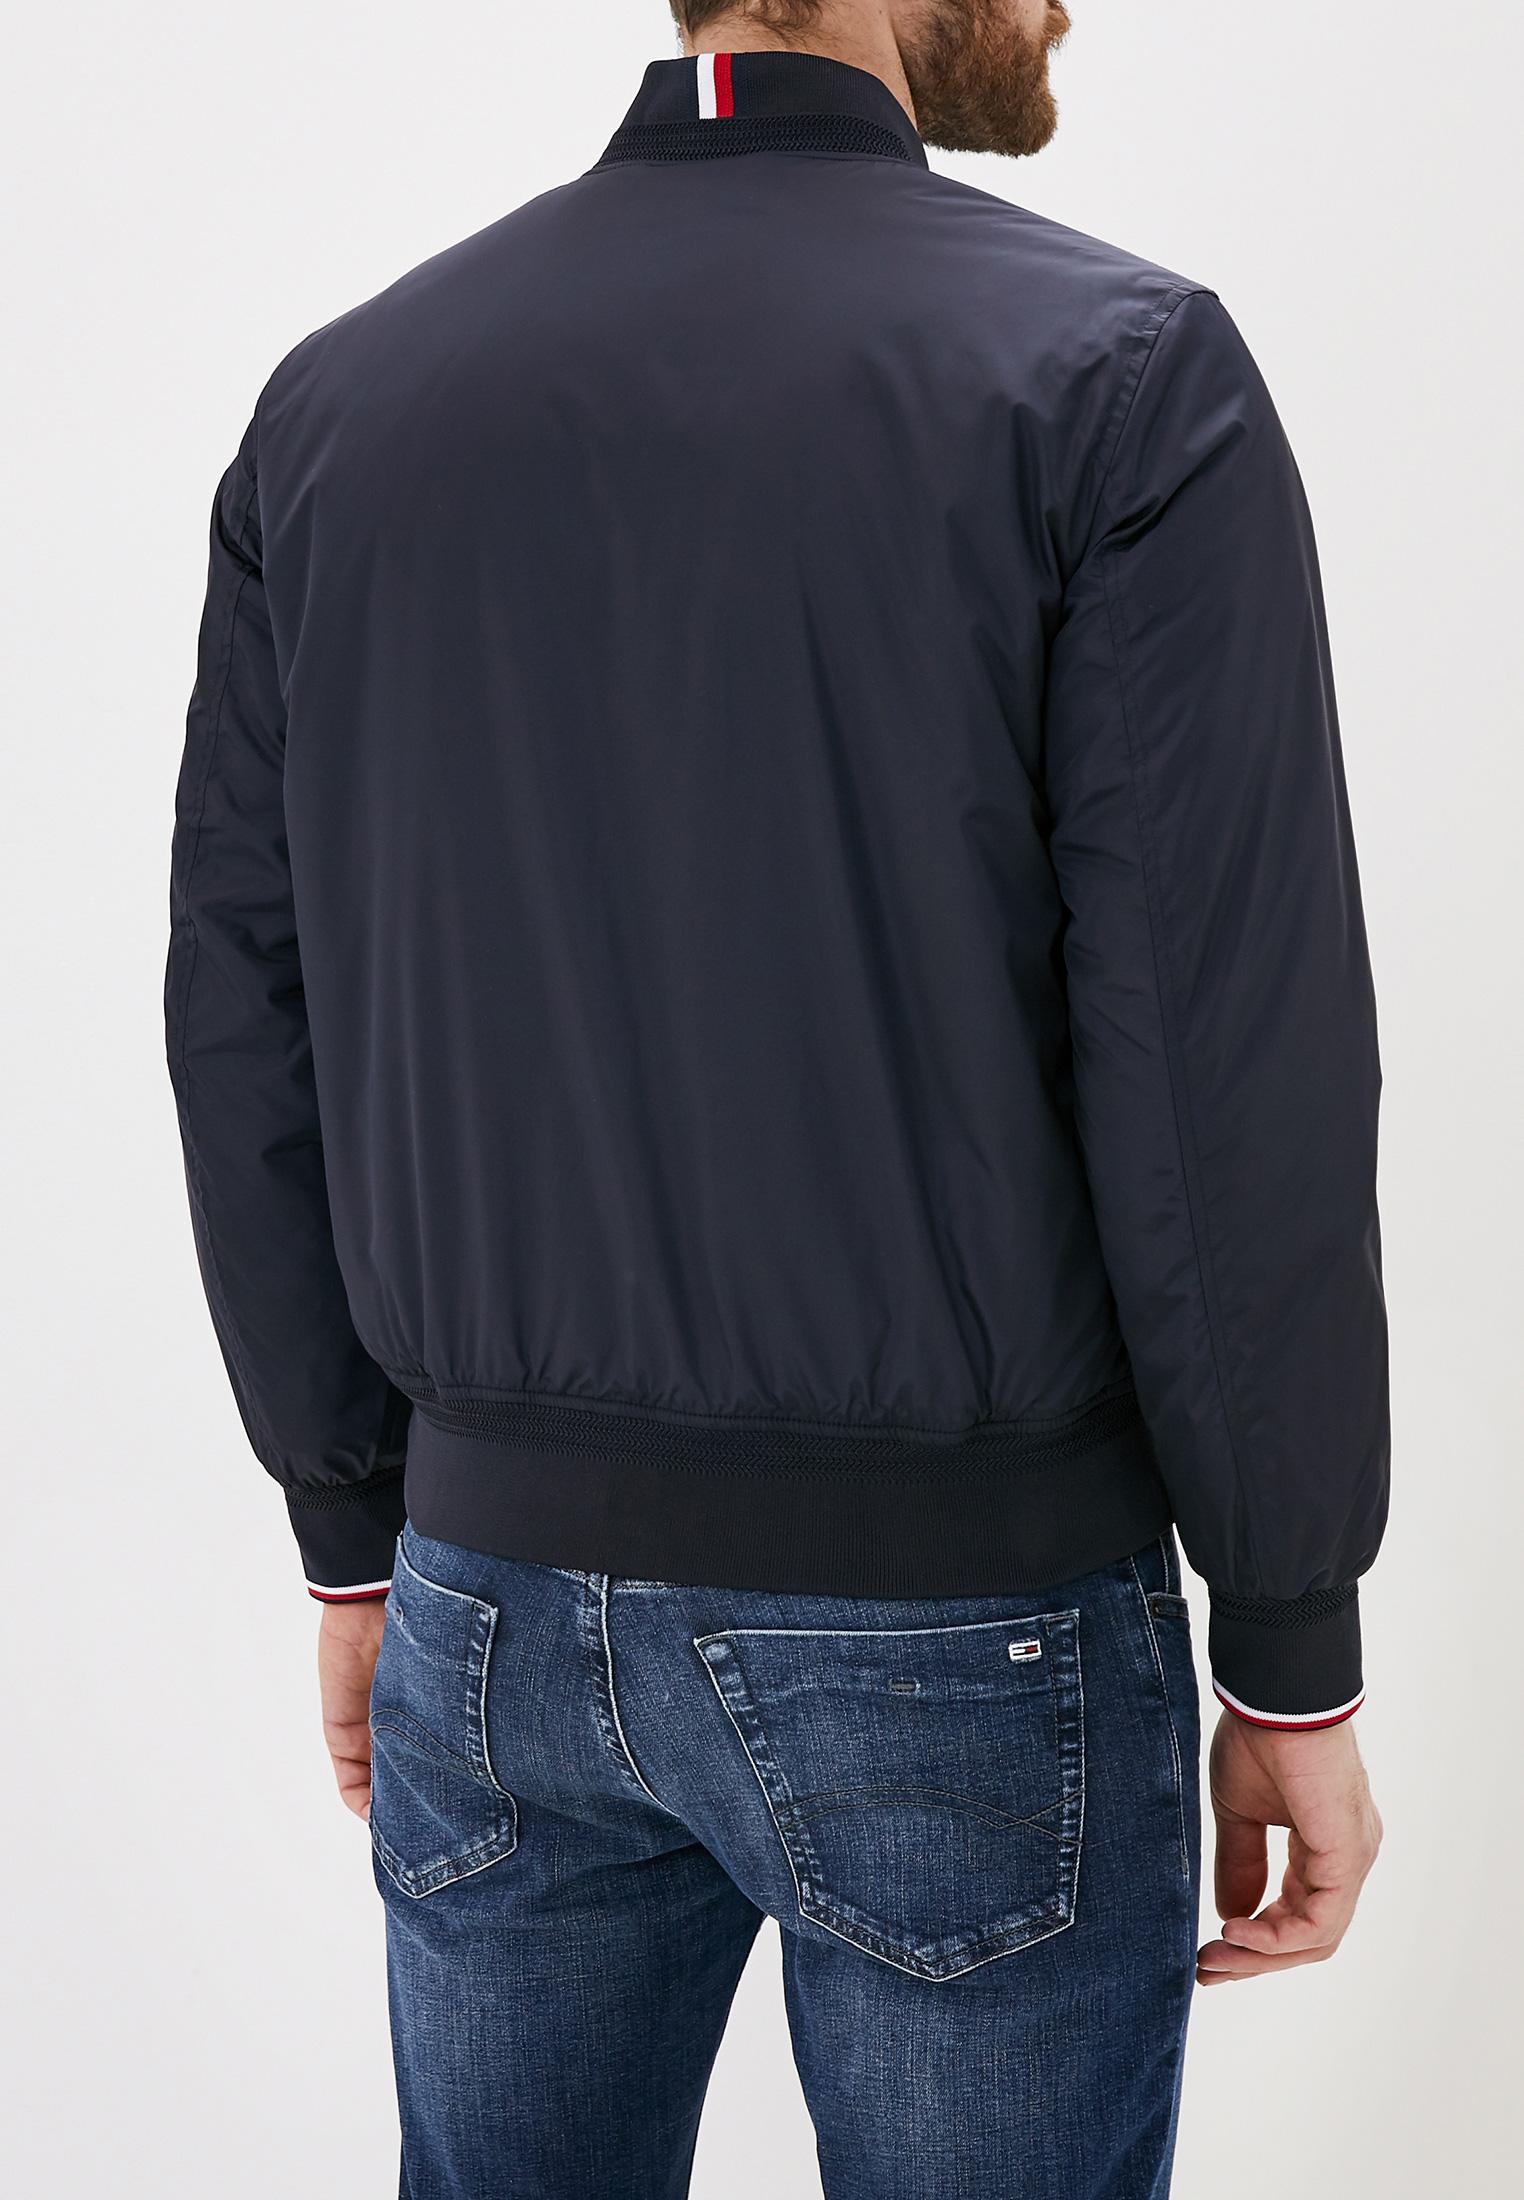 Куртка Tommy Hilfiger (Томми Хилфигер) MW0MW12006: изображение 3